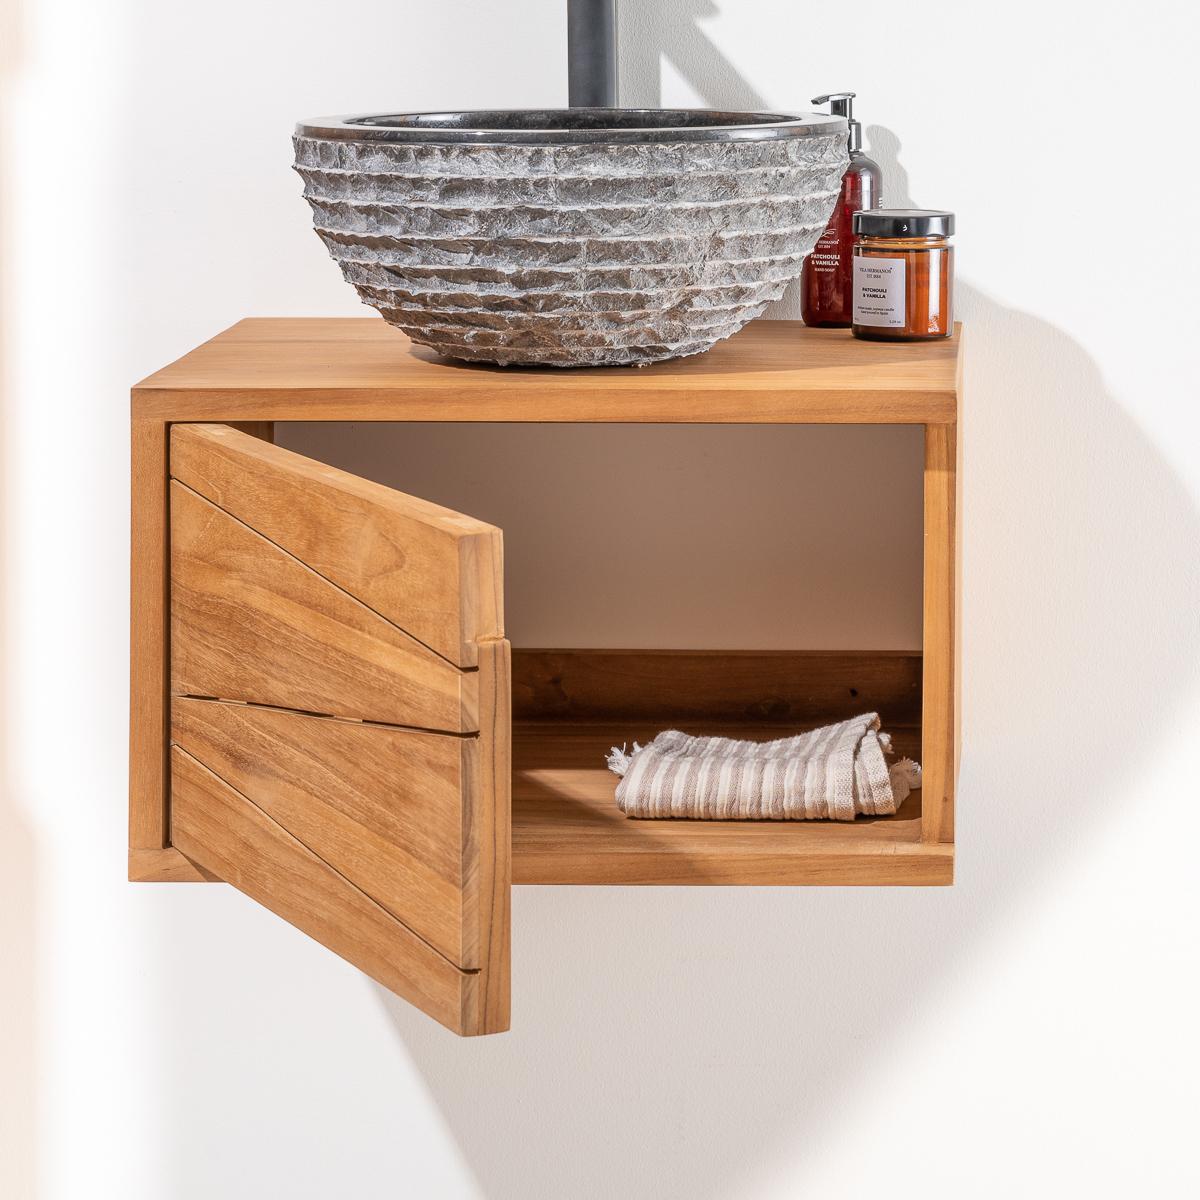 meuble salle de bain meuble suspendu teck cosy rectangle naturel 50 cm. Black Bedroom Furniture Sets. Home Design Ideas